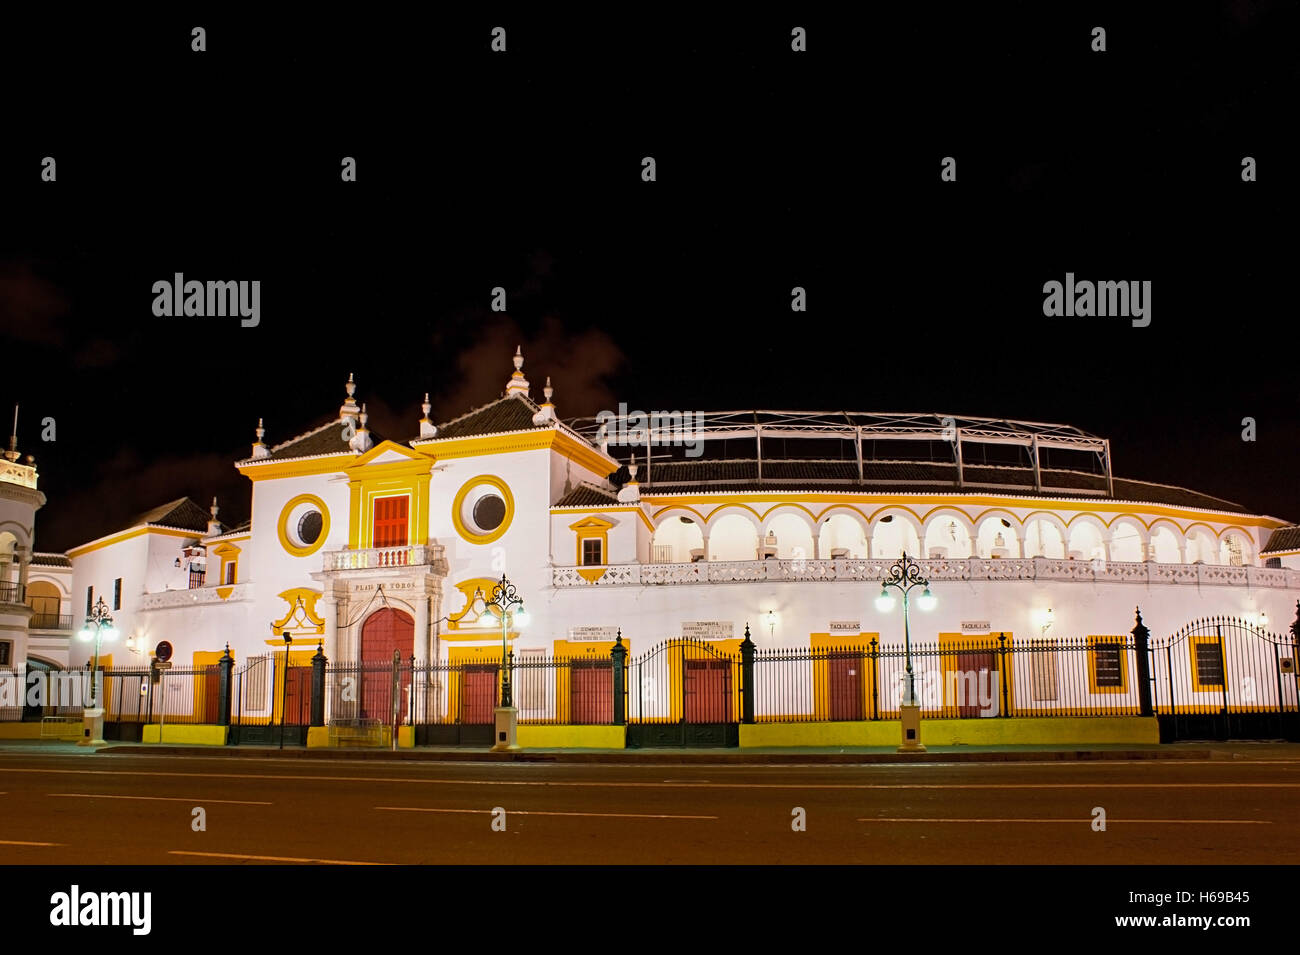 The Plaza de Toros de la Real Maestranza is the famous arena for bullfights - Stock Image